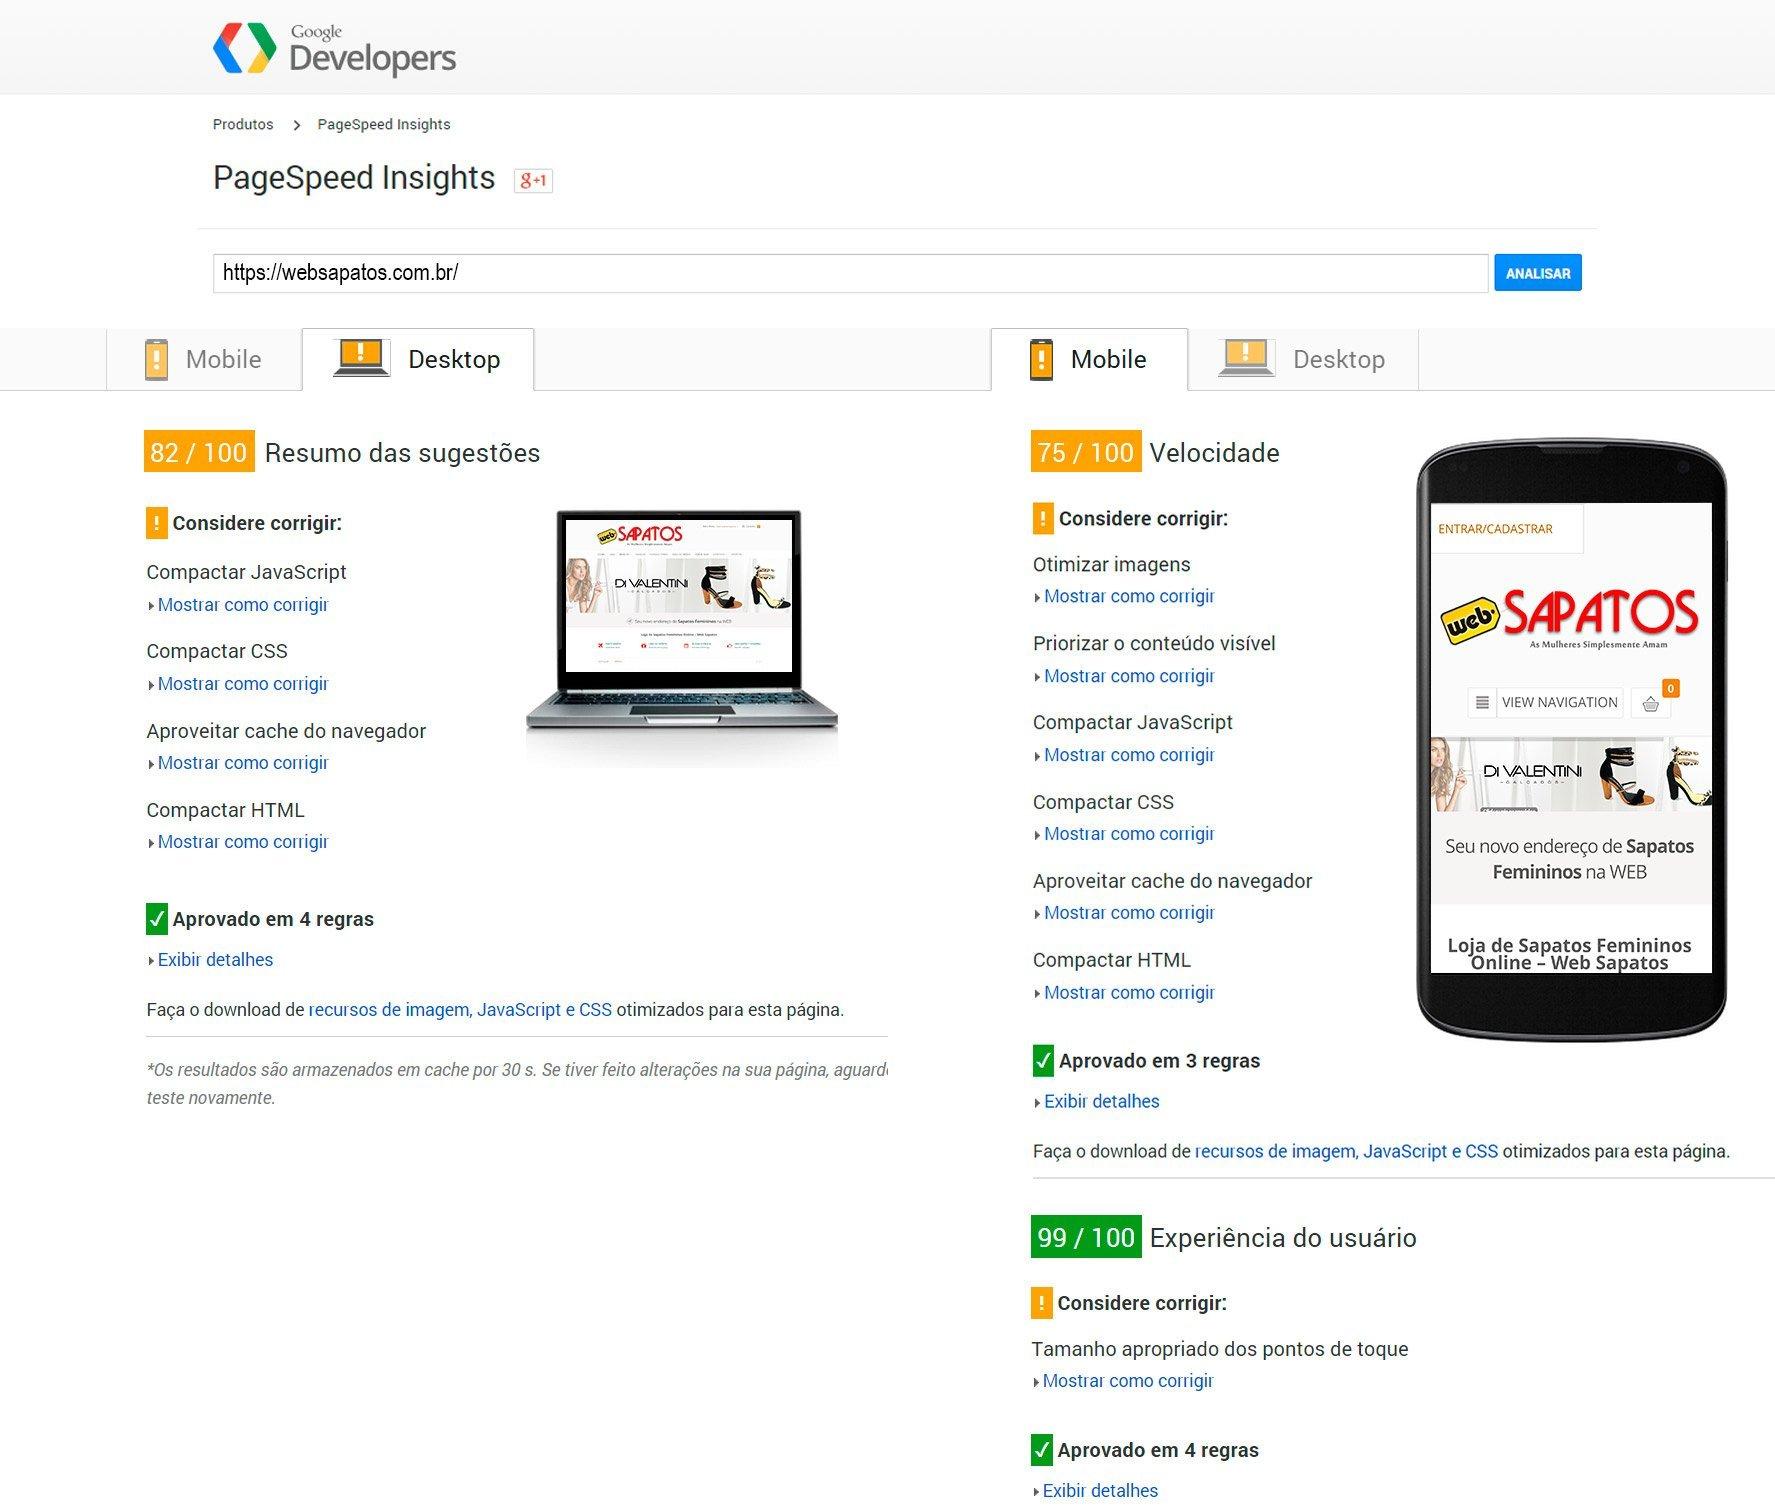 Google Page Speed Insights Websapatos